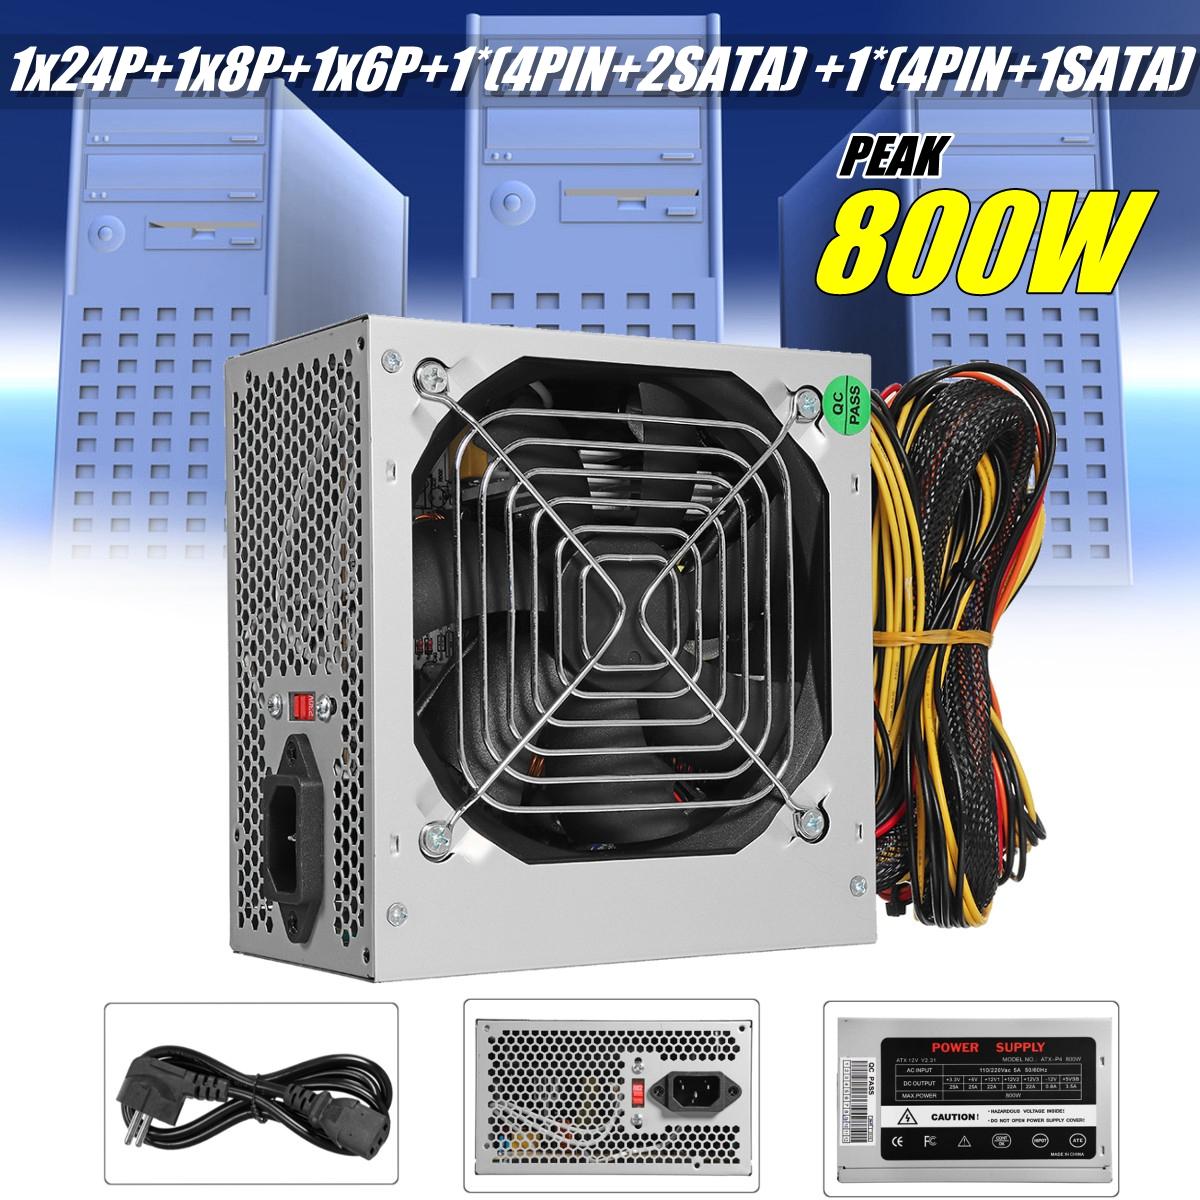 800w Power Supply Psu Pfc Silent Fan Atx 24 Pin Pc Computer Gaming Inside Circuits Gt Ac To Dc Converter L9088 Nextgr Au